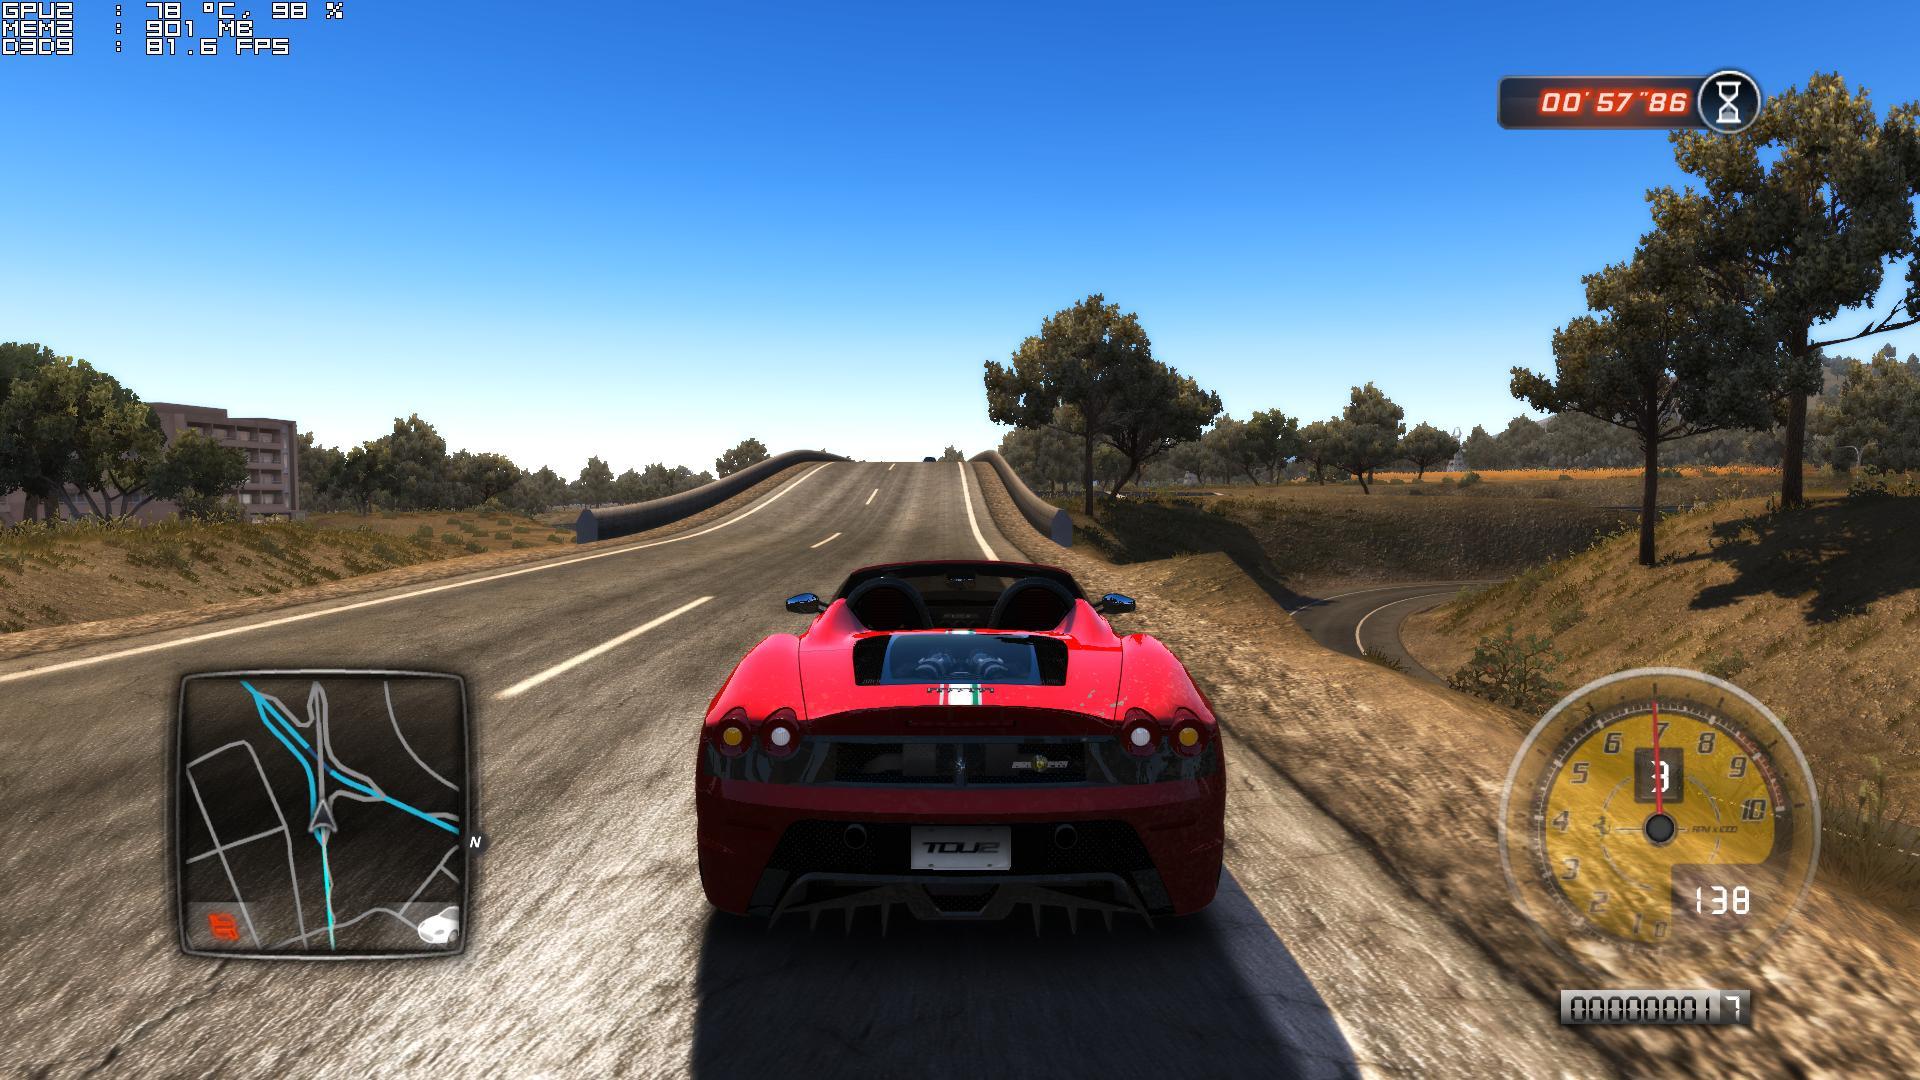 Test Drive Машины Игра